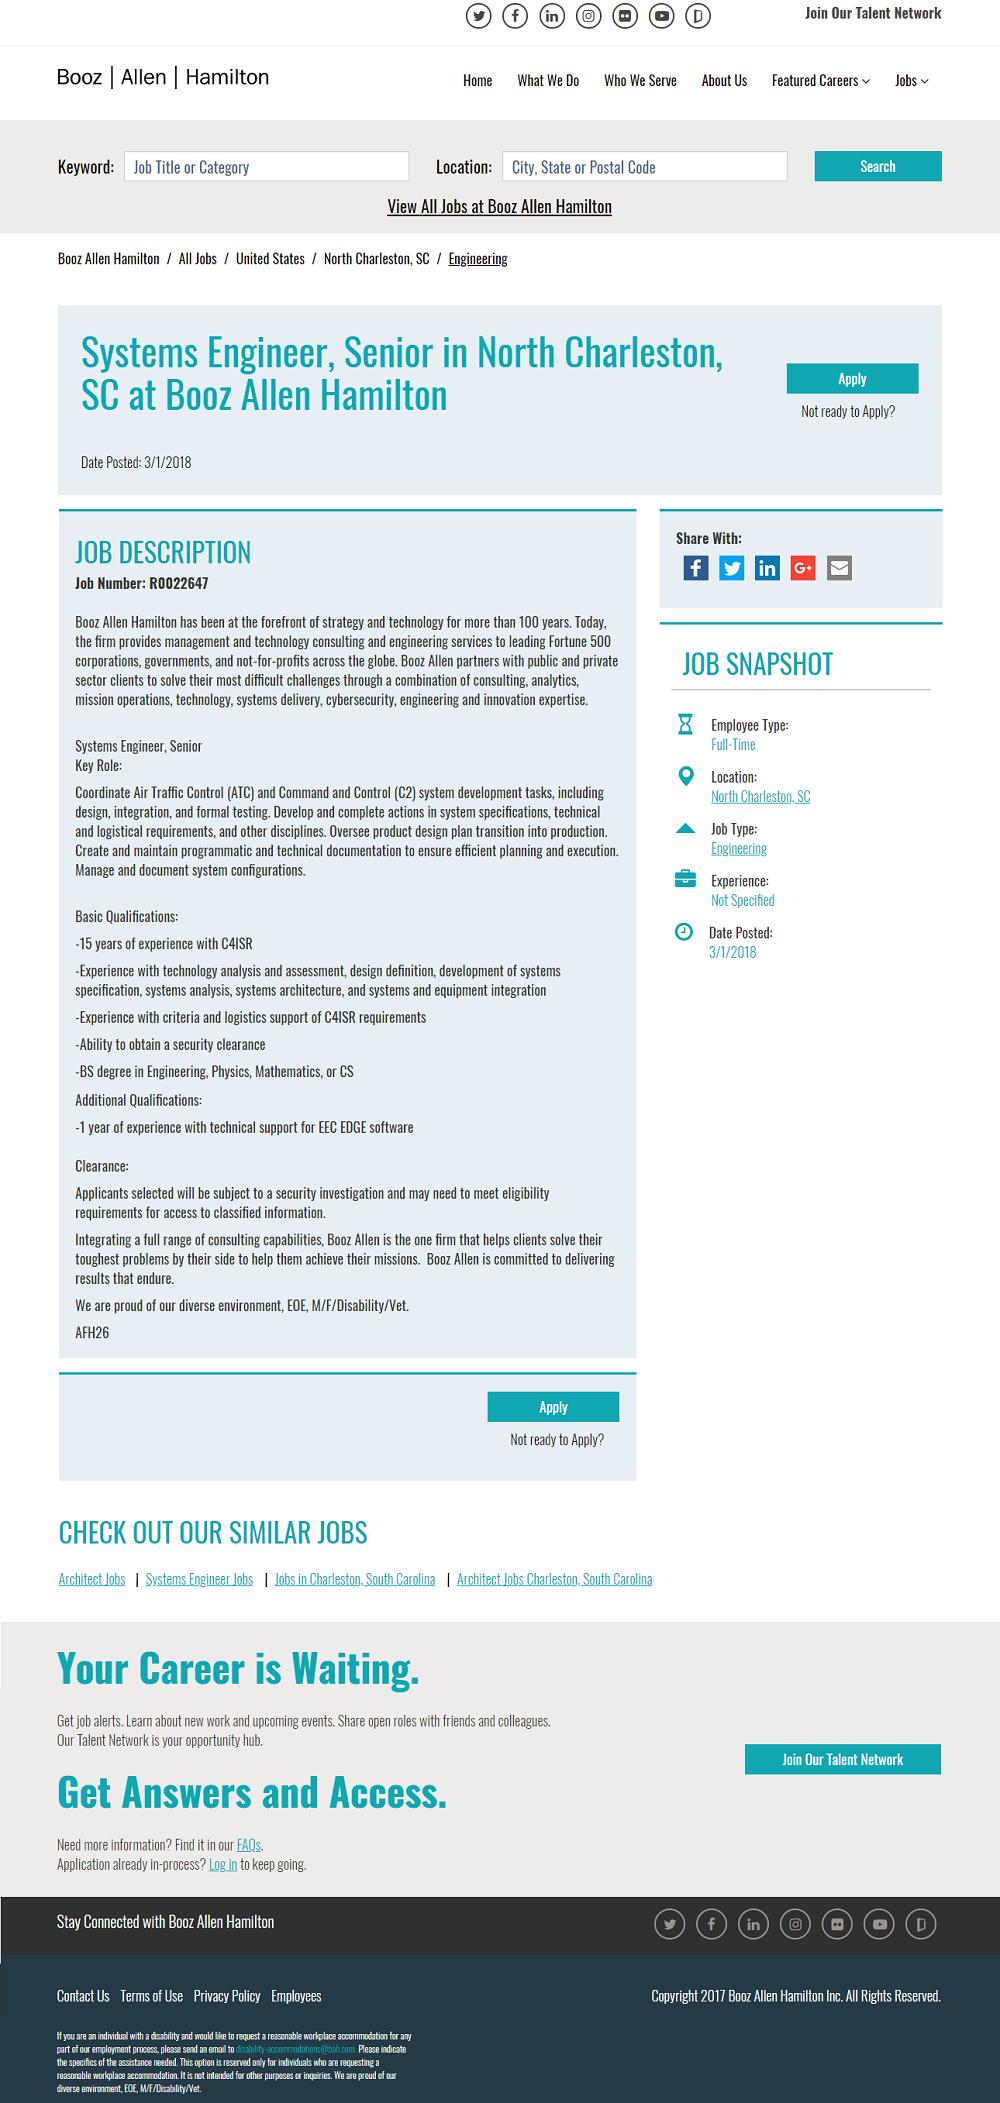 Workday ATS Job Page Overlay   Booz Allen Hamilton